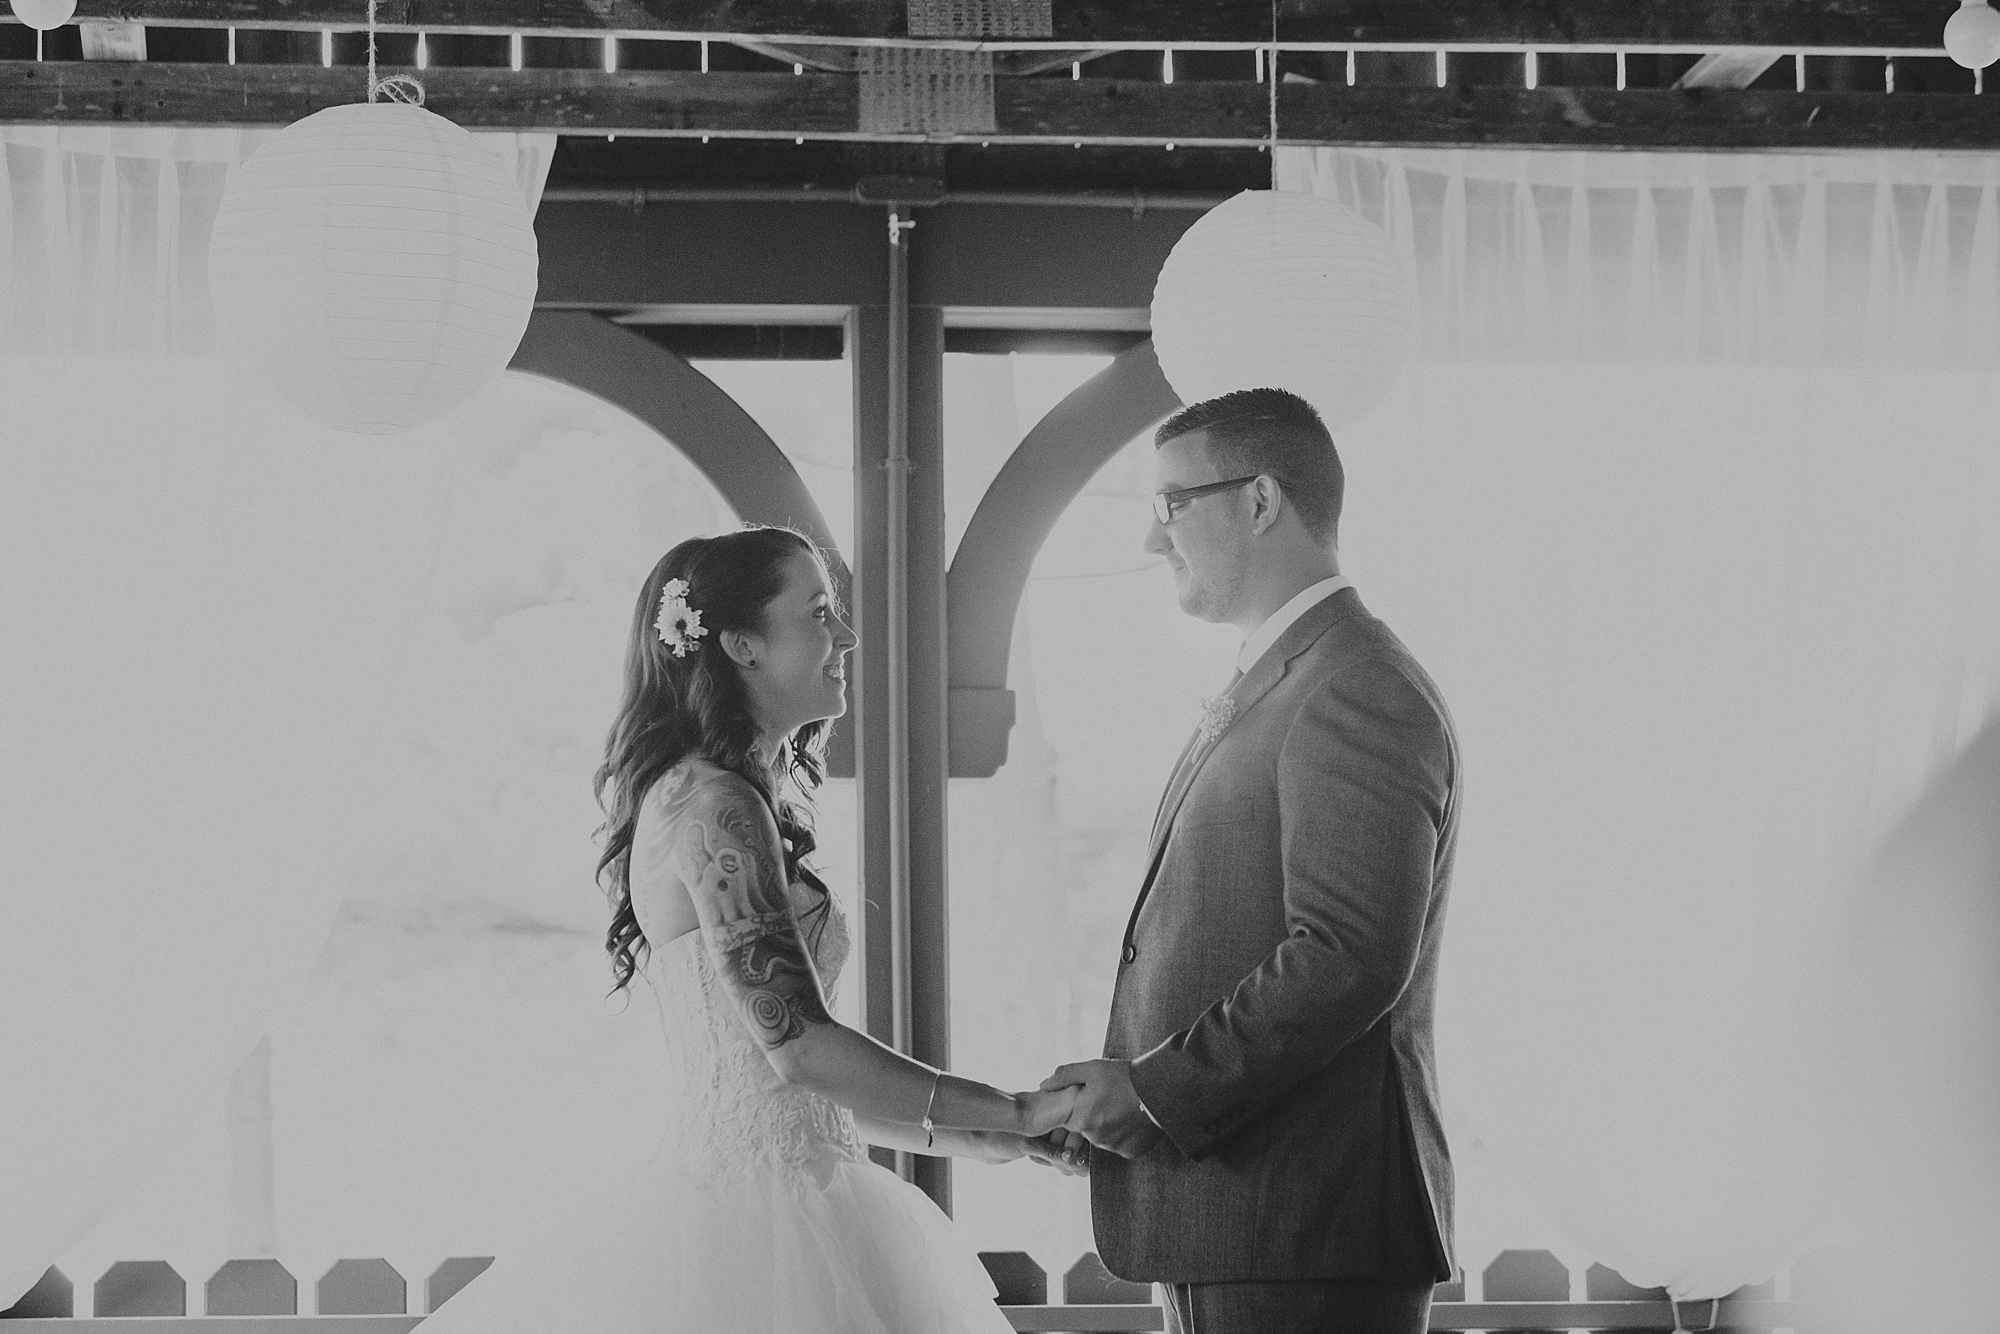 lipapark-hernderwinery-wedding_0062.jpg